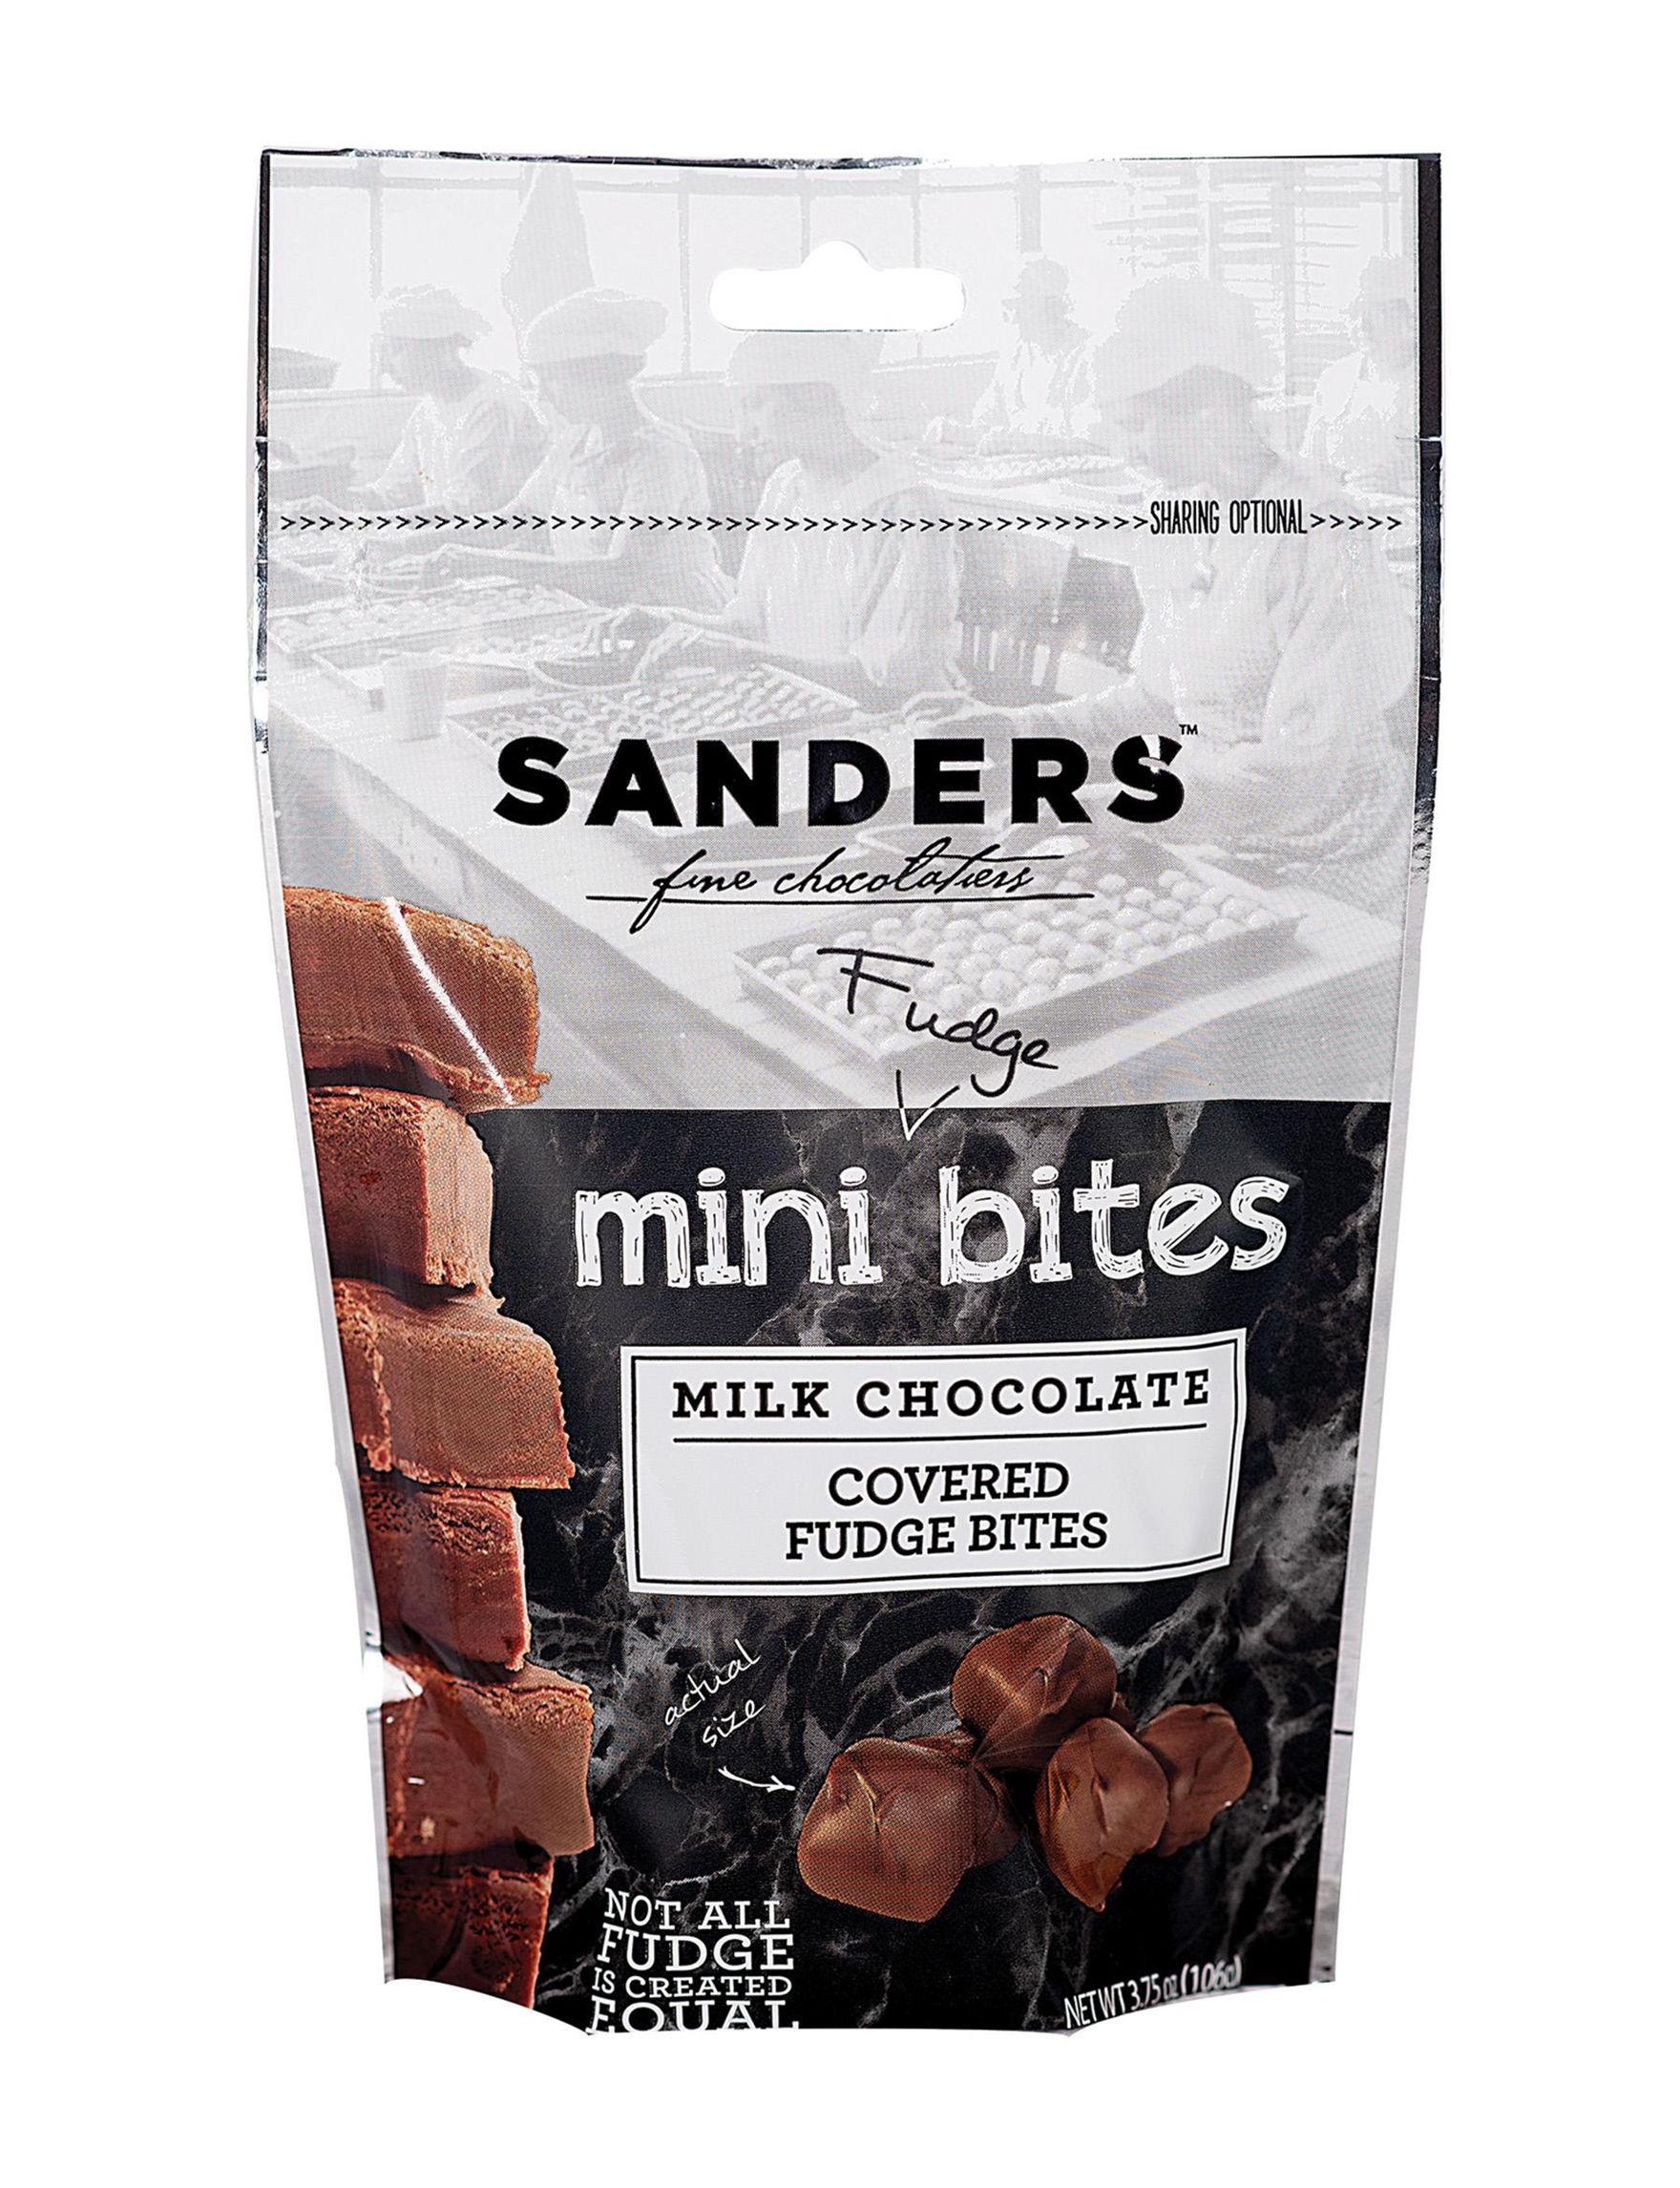 Sanders Fine Chocolatiers White Gourmet Food & Beverages